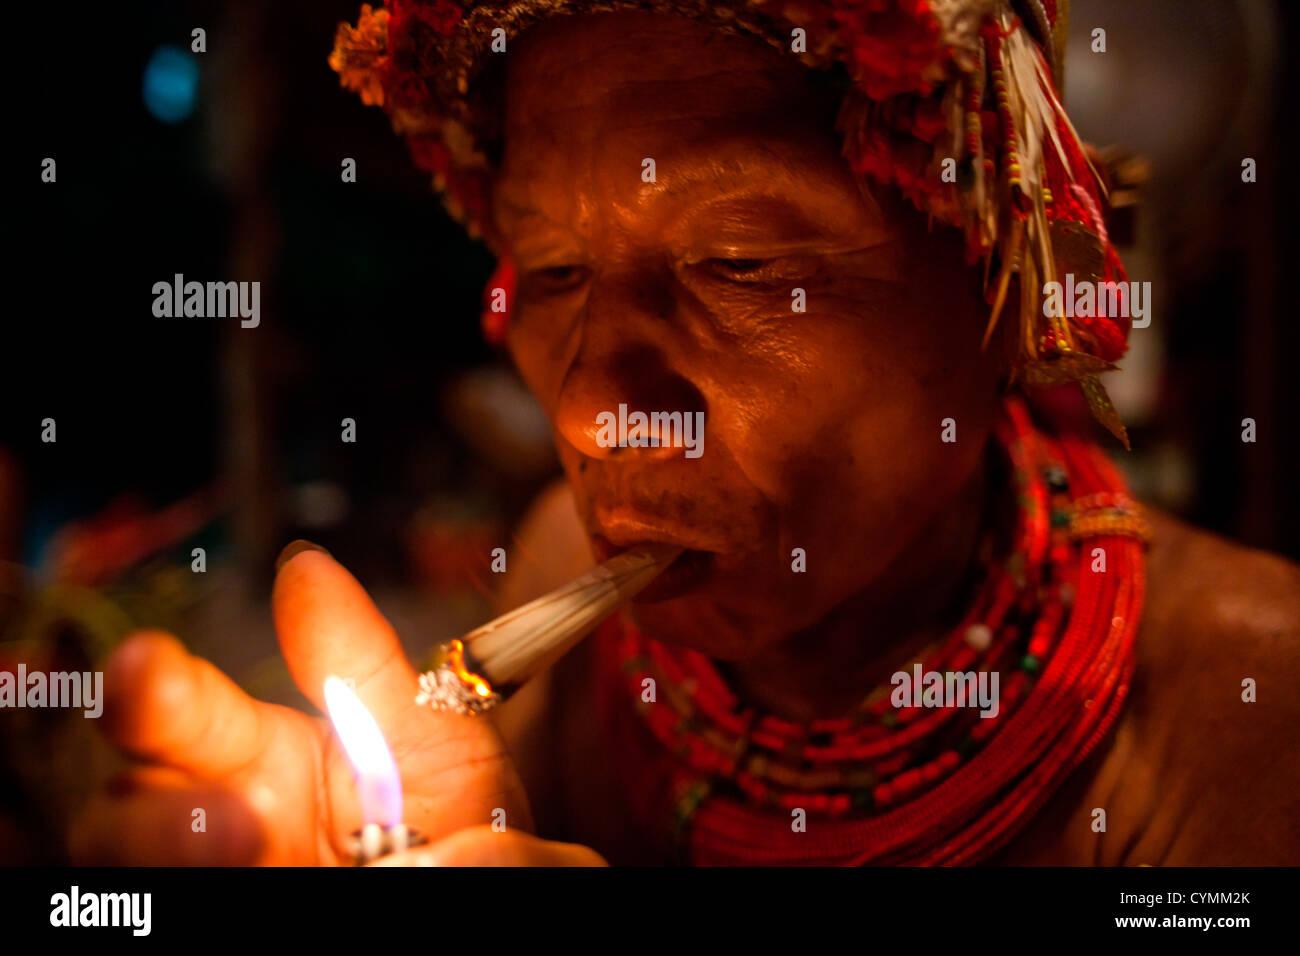 Mentawai Medicine men, covered in tattoos, perform ceremonies for visitors on Kandui Island, including dancing, - Stock Image